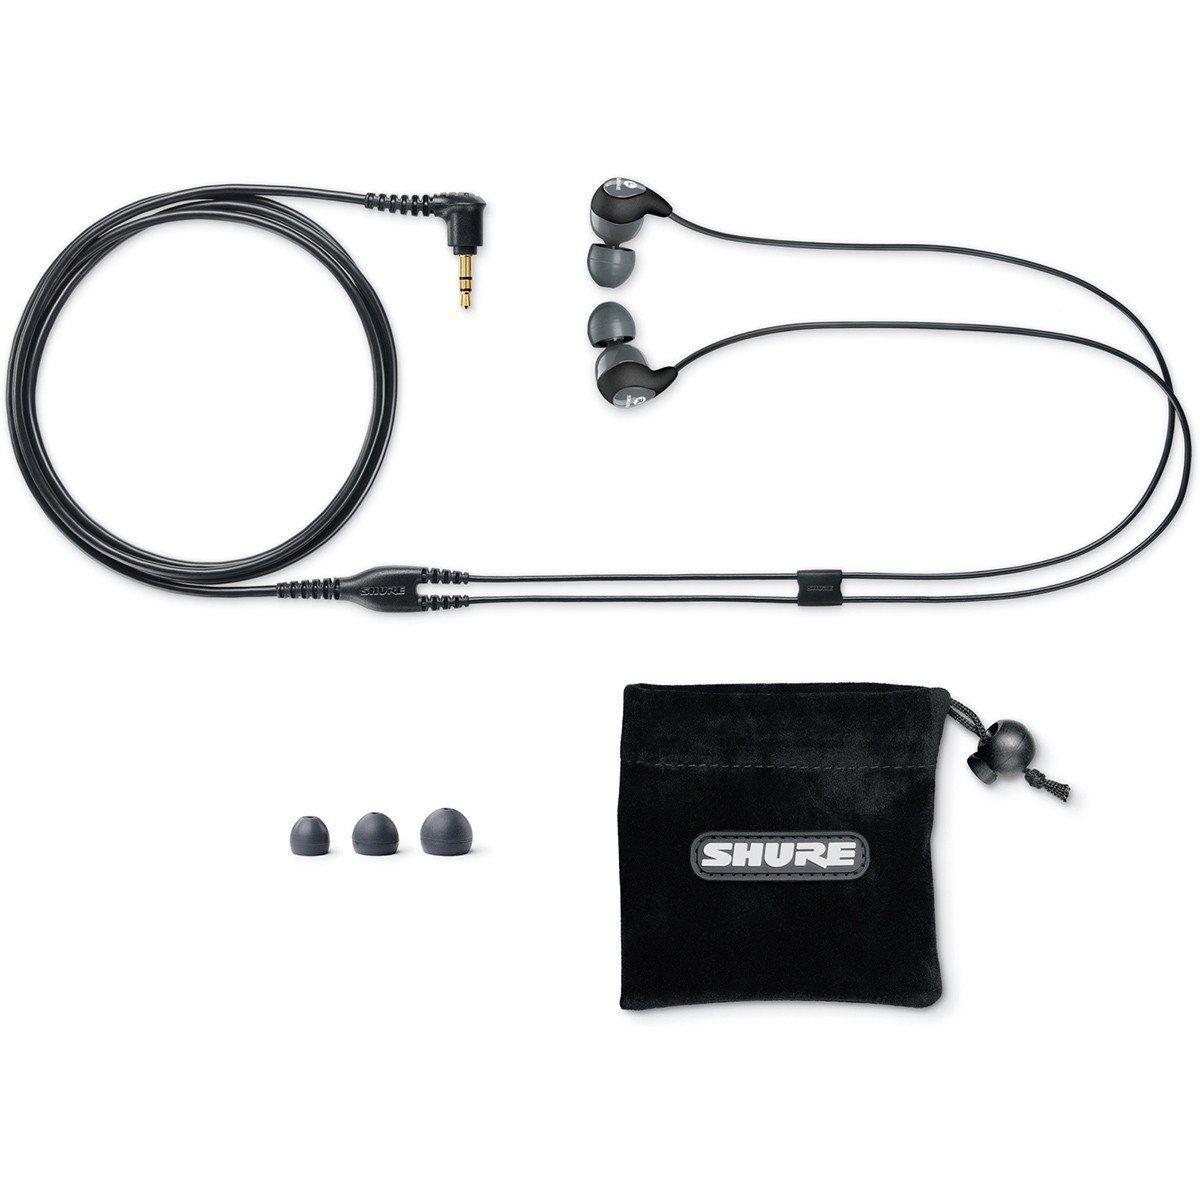 Shure SE112M GR EPS Fone de Ouvido SE112-GR-EPS In-Ear para Retorno de Palco